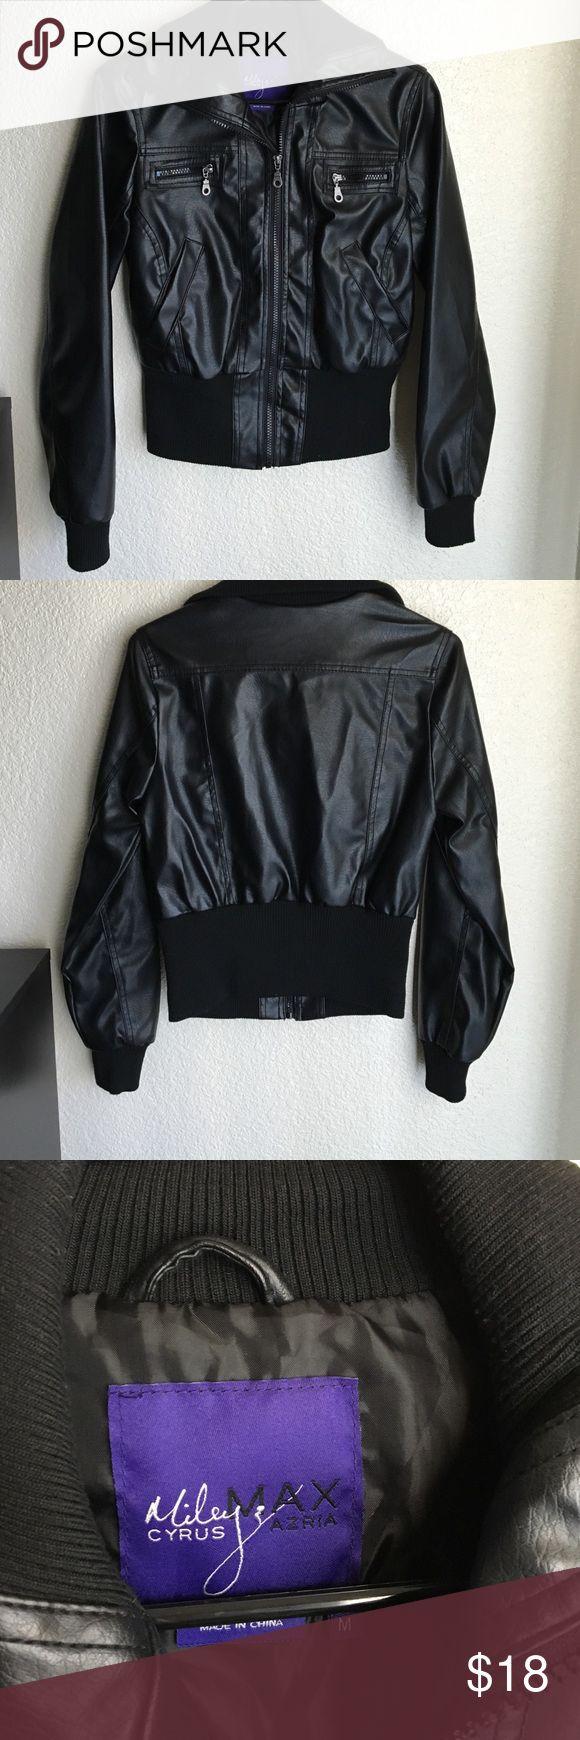 Faux Leather Miley Cyrus/Max Azria Jacket Faux Leather Miley Cyrus/Max Azria Jacket - worn once Jackets & Coats